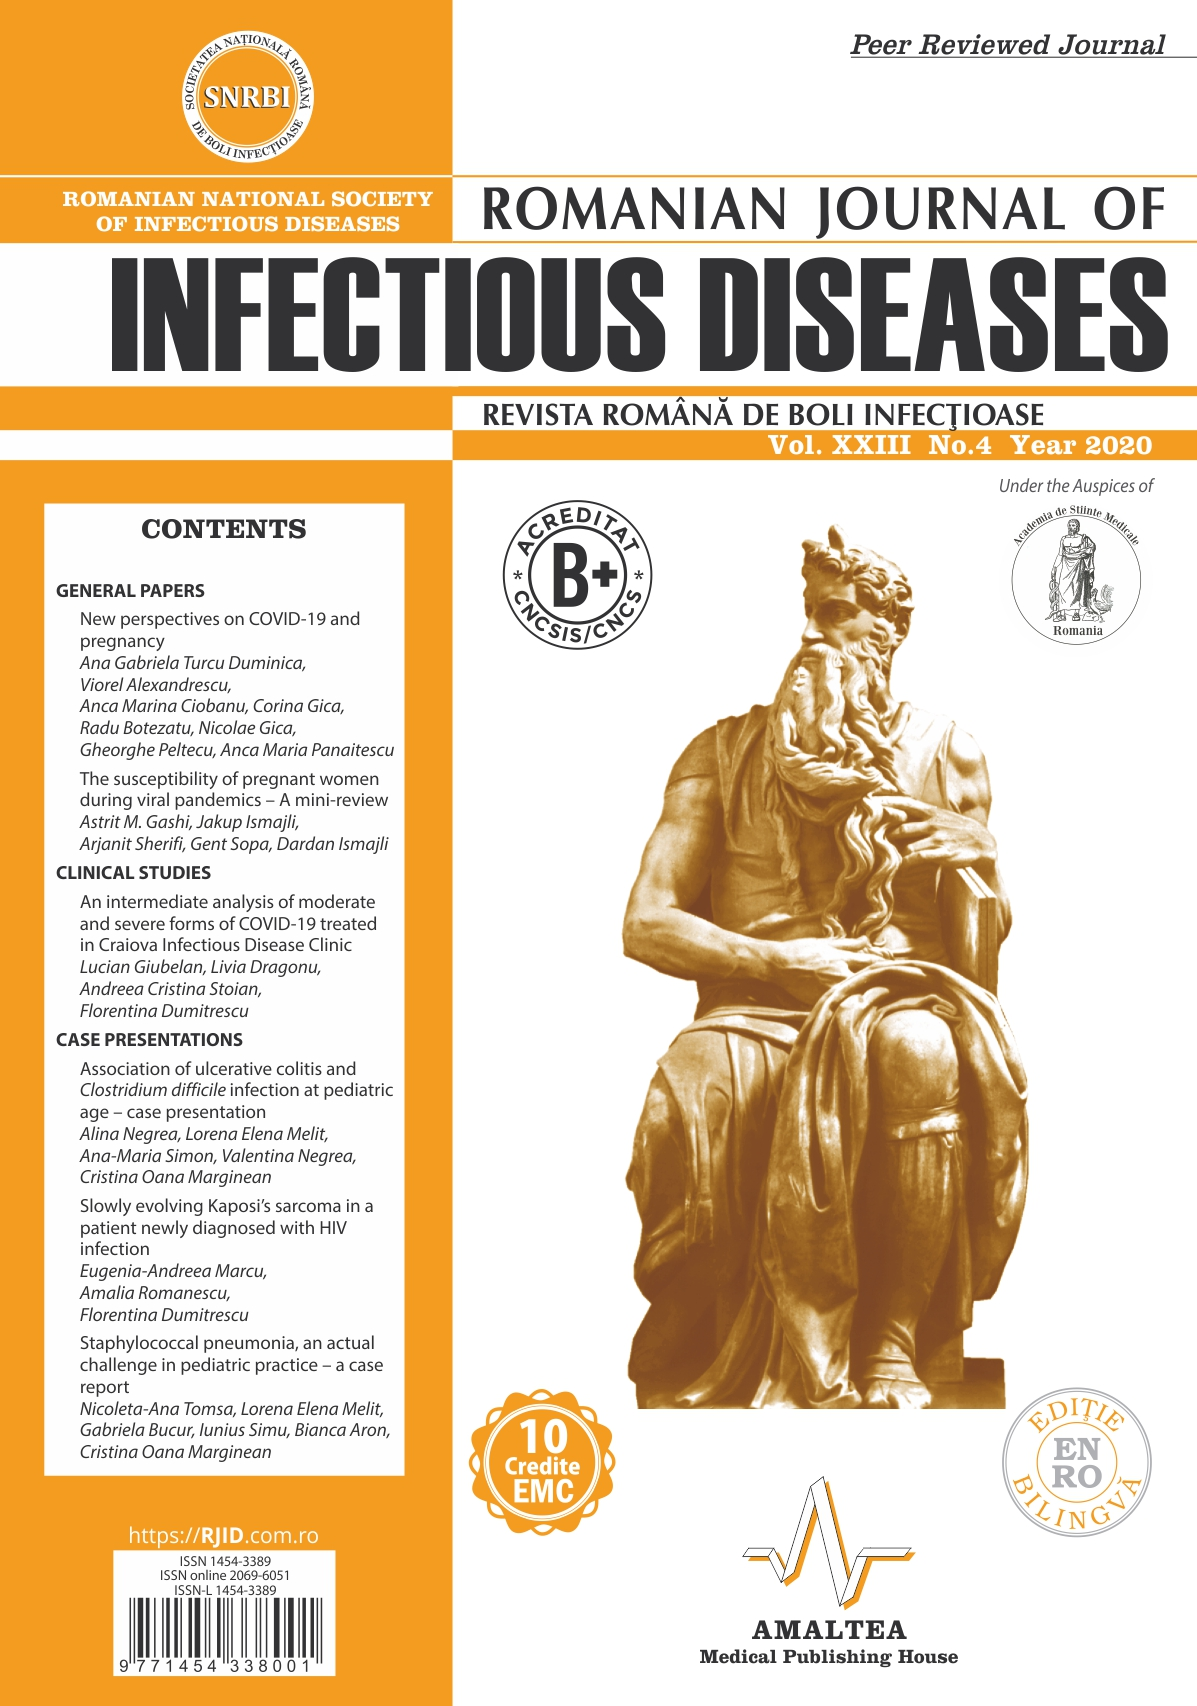 Revista Romana de Boli Infectioase | Vol. XXIII, No. 4, 2020